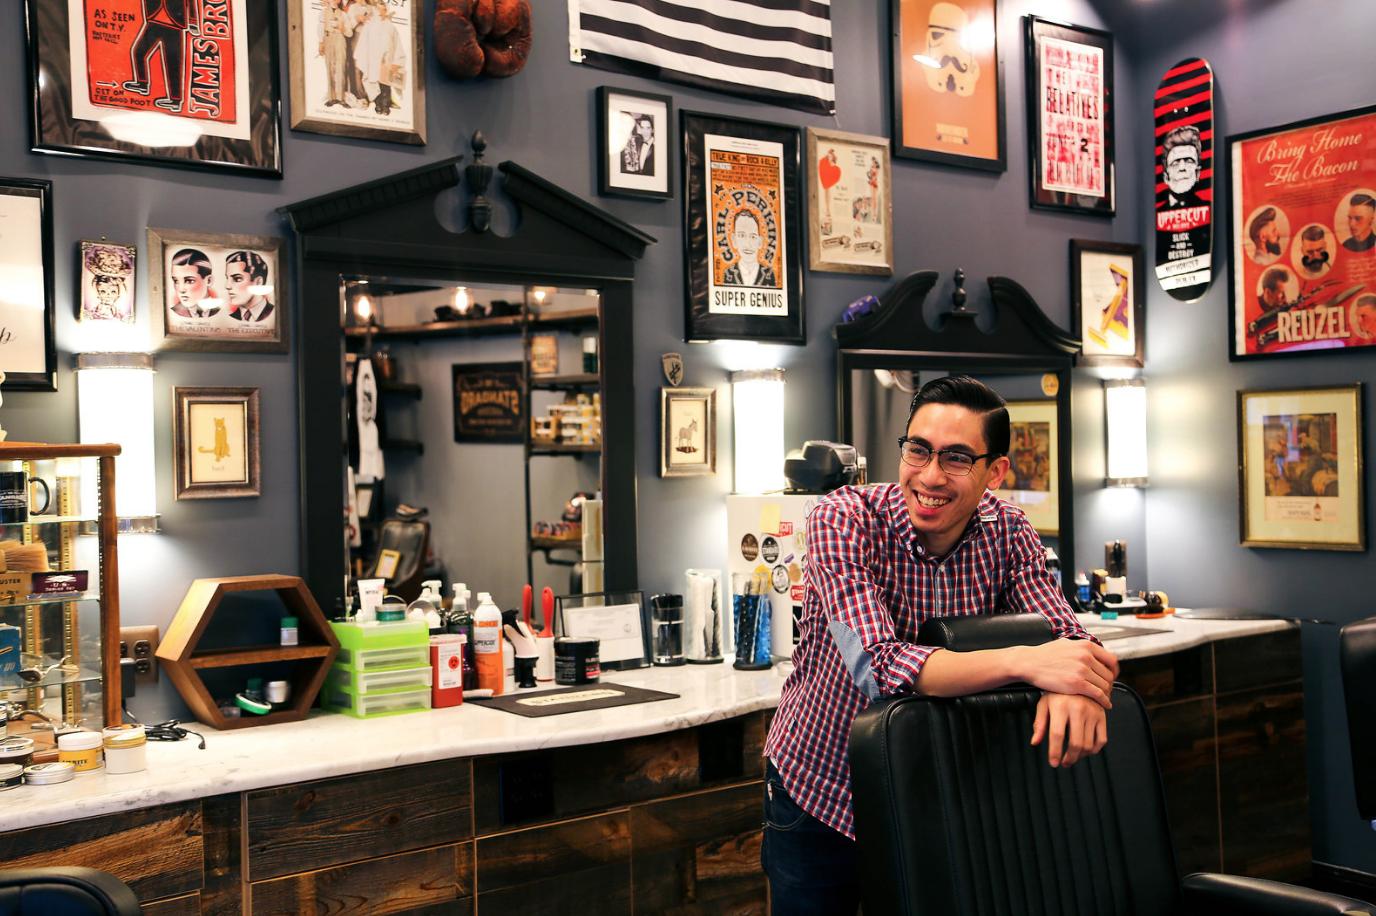 Marco, barber